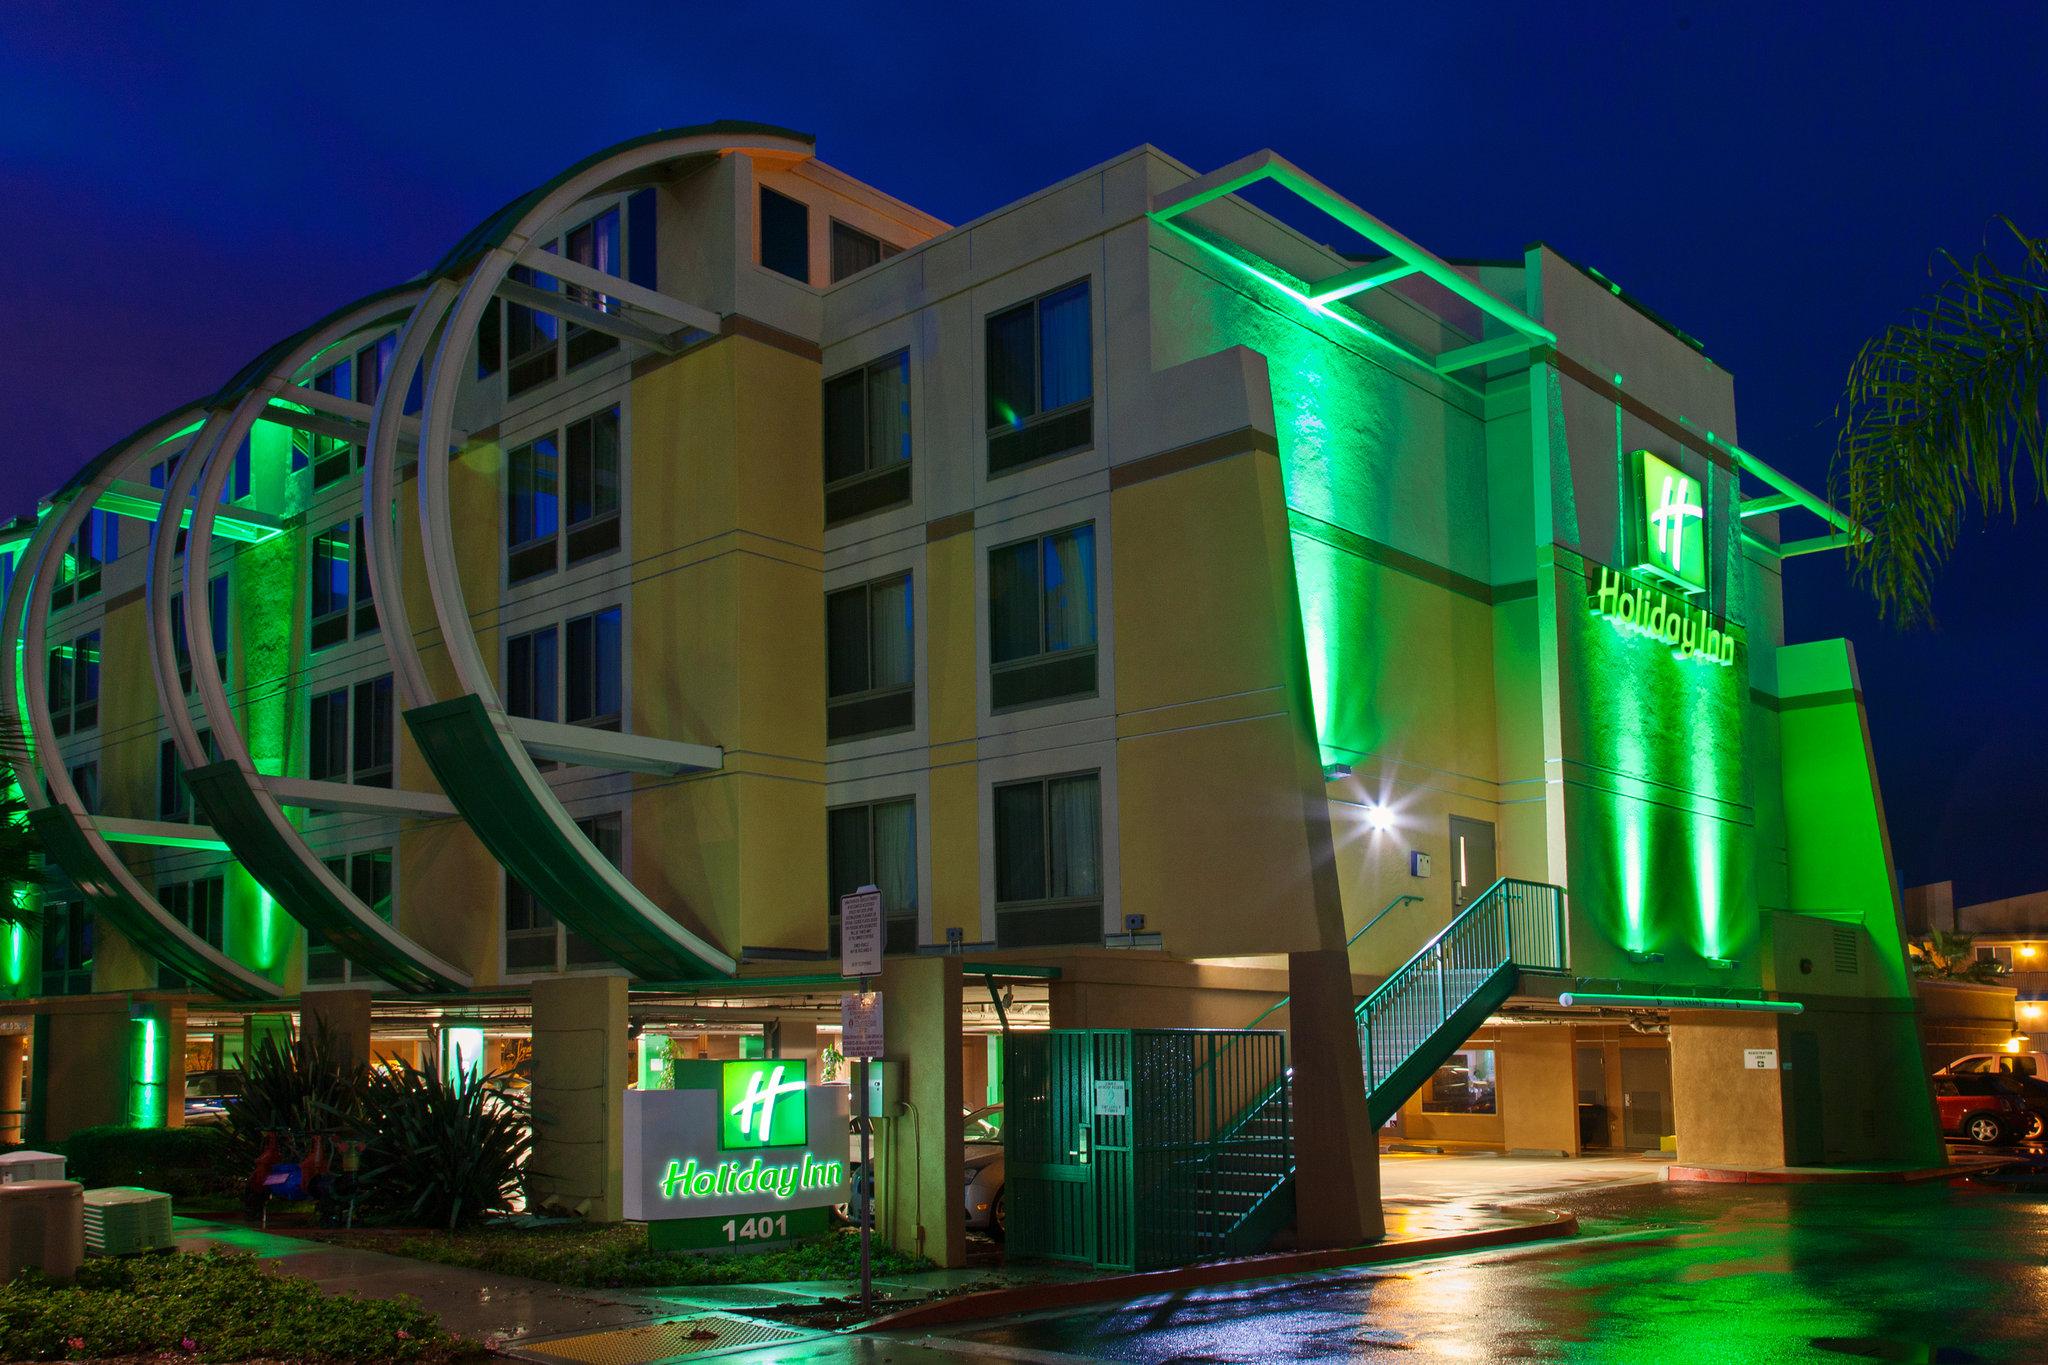 Holiday Inn Oceanside Marina- Pendleton